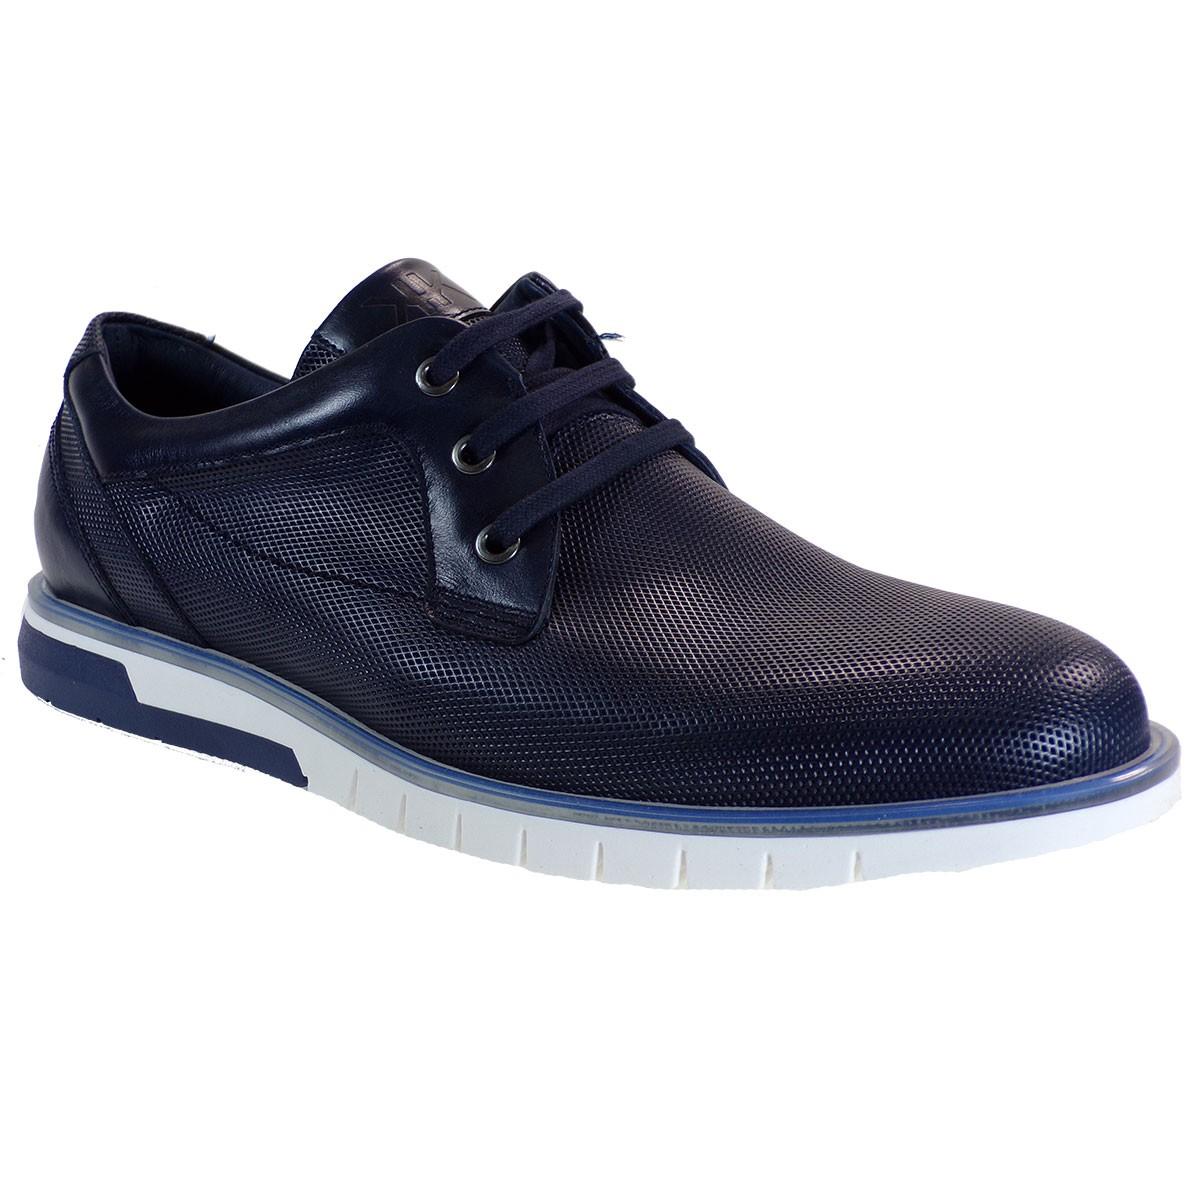 kricket Ανδρικά Παπούτσια K8 Μπλέ Δέρμα